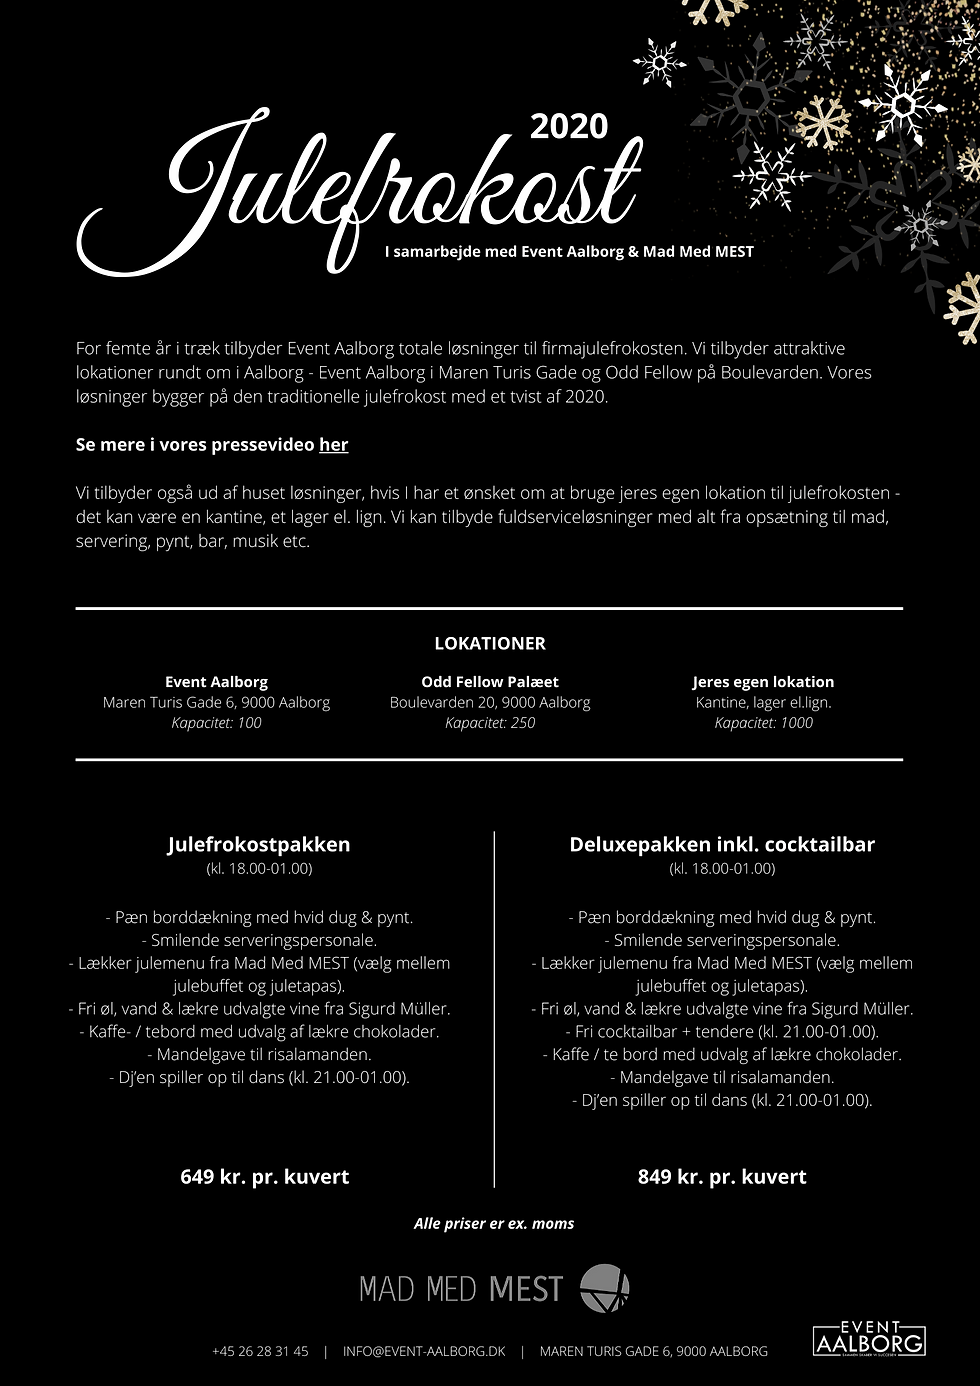 Event Aalborg - Julefrokost 2020, side 1